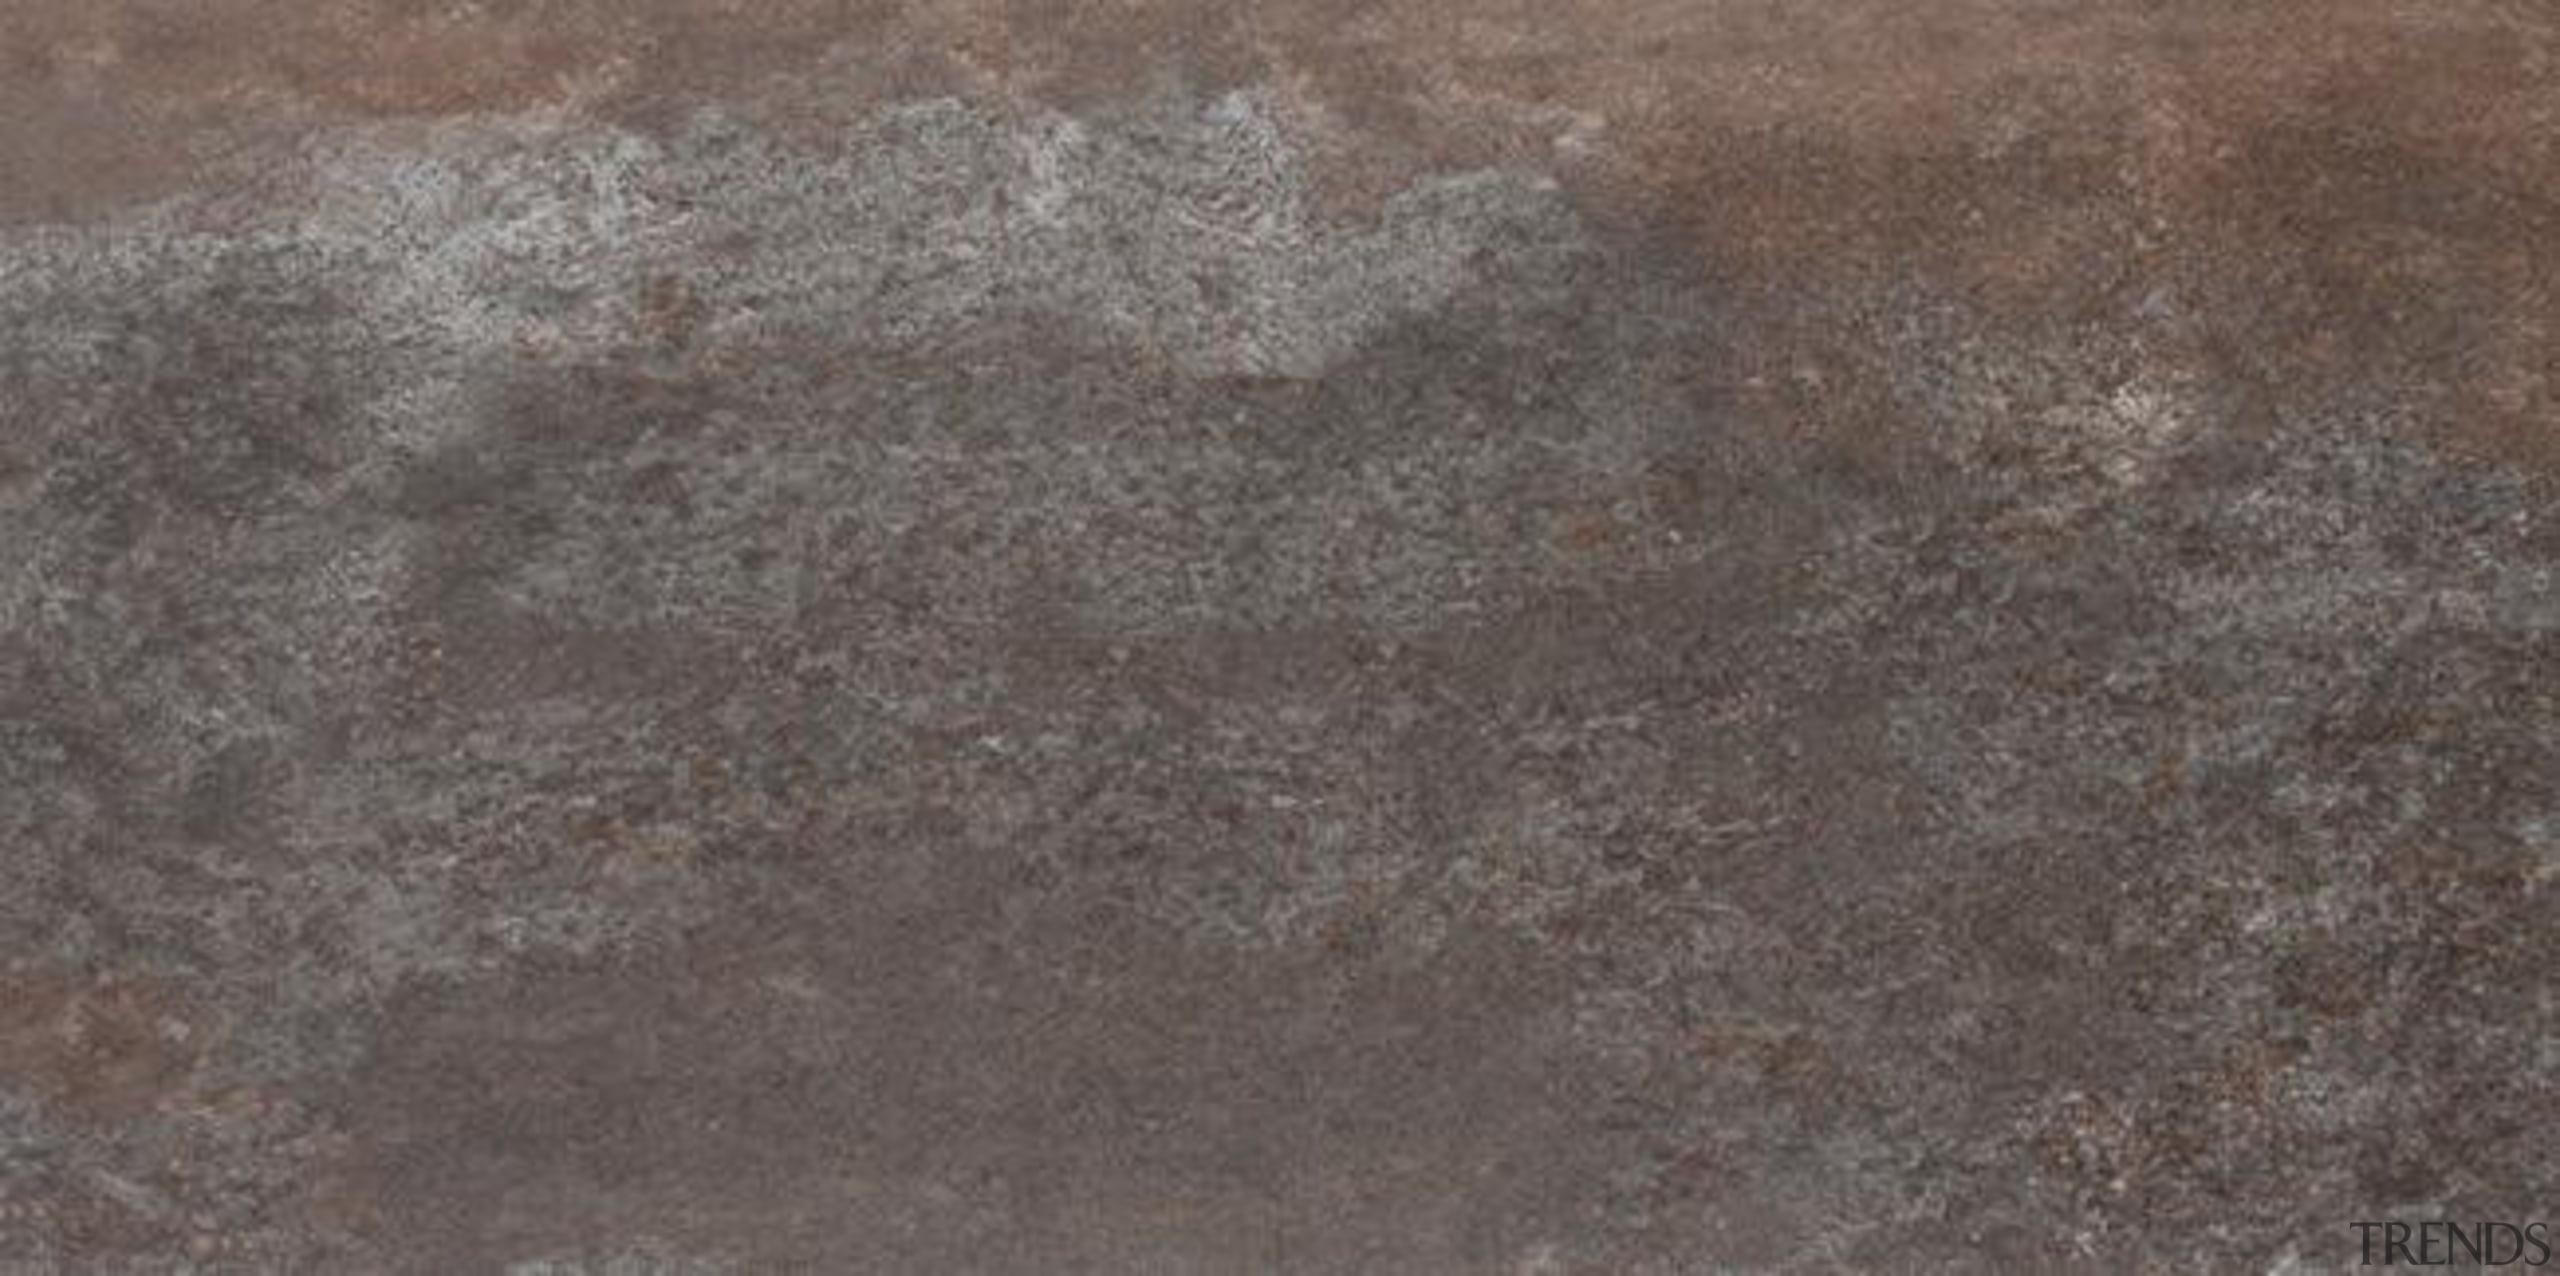 1200x600mm porcelain tiles - Steel Corten Matt Tile brown, soil, texture, gray